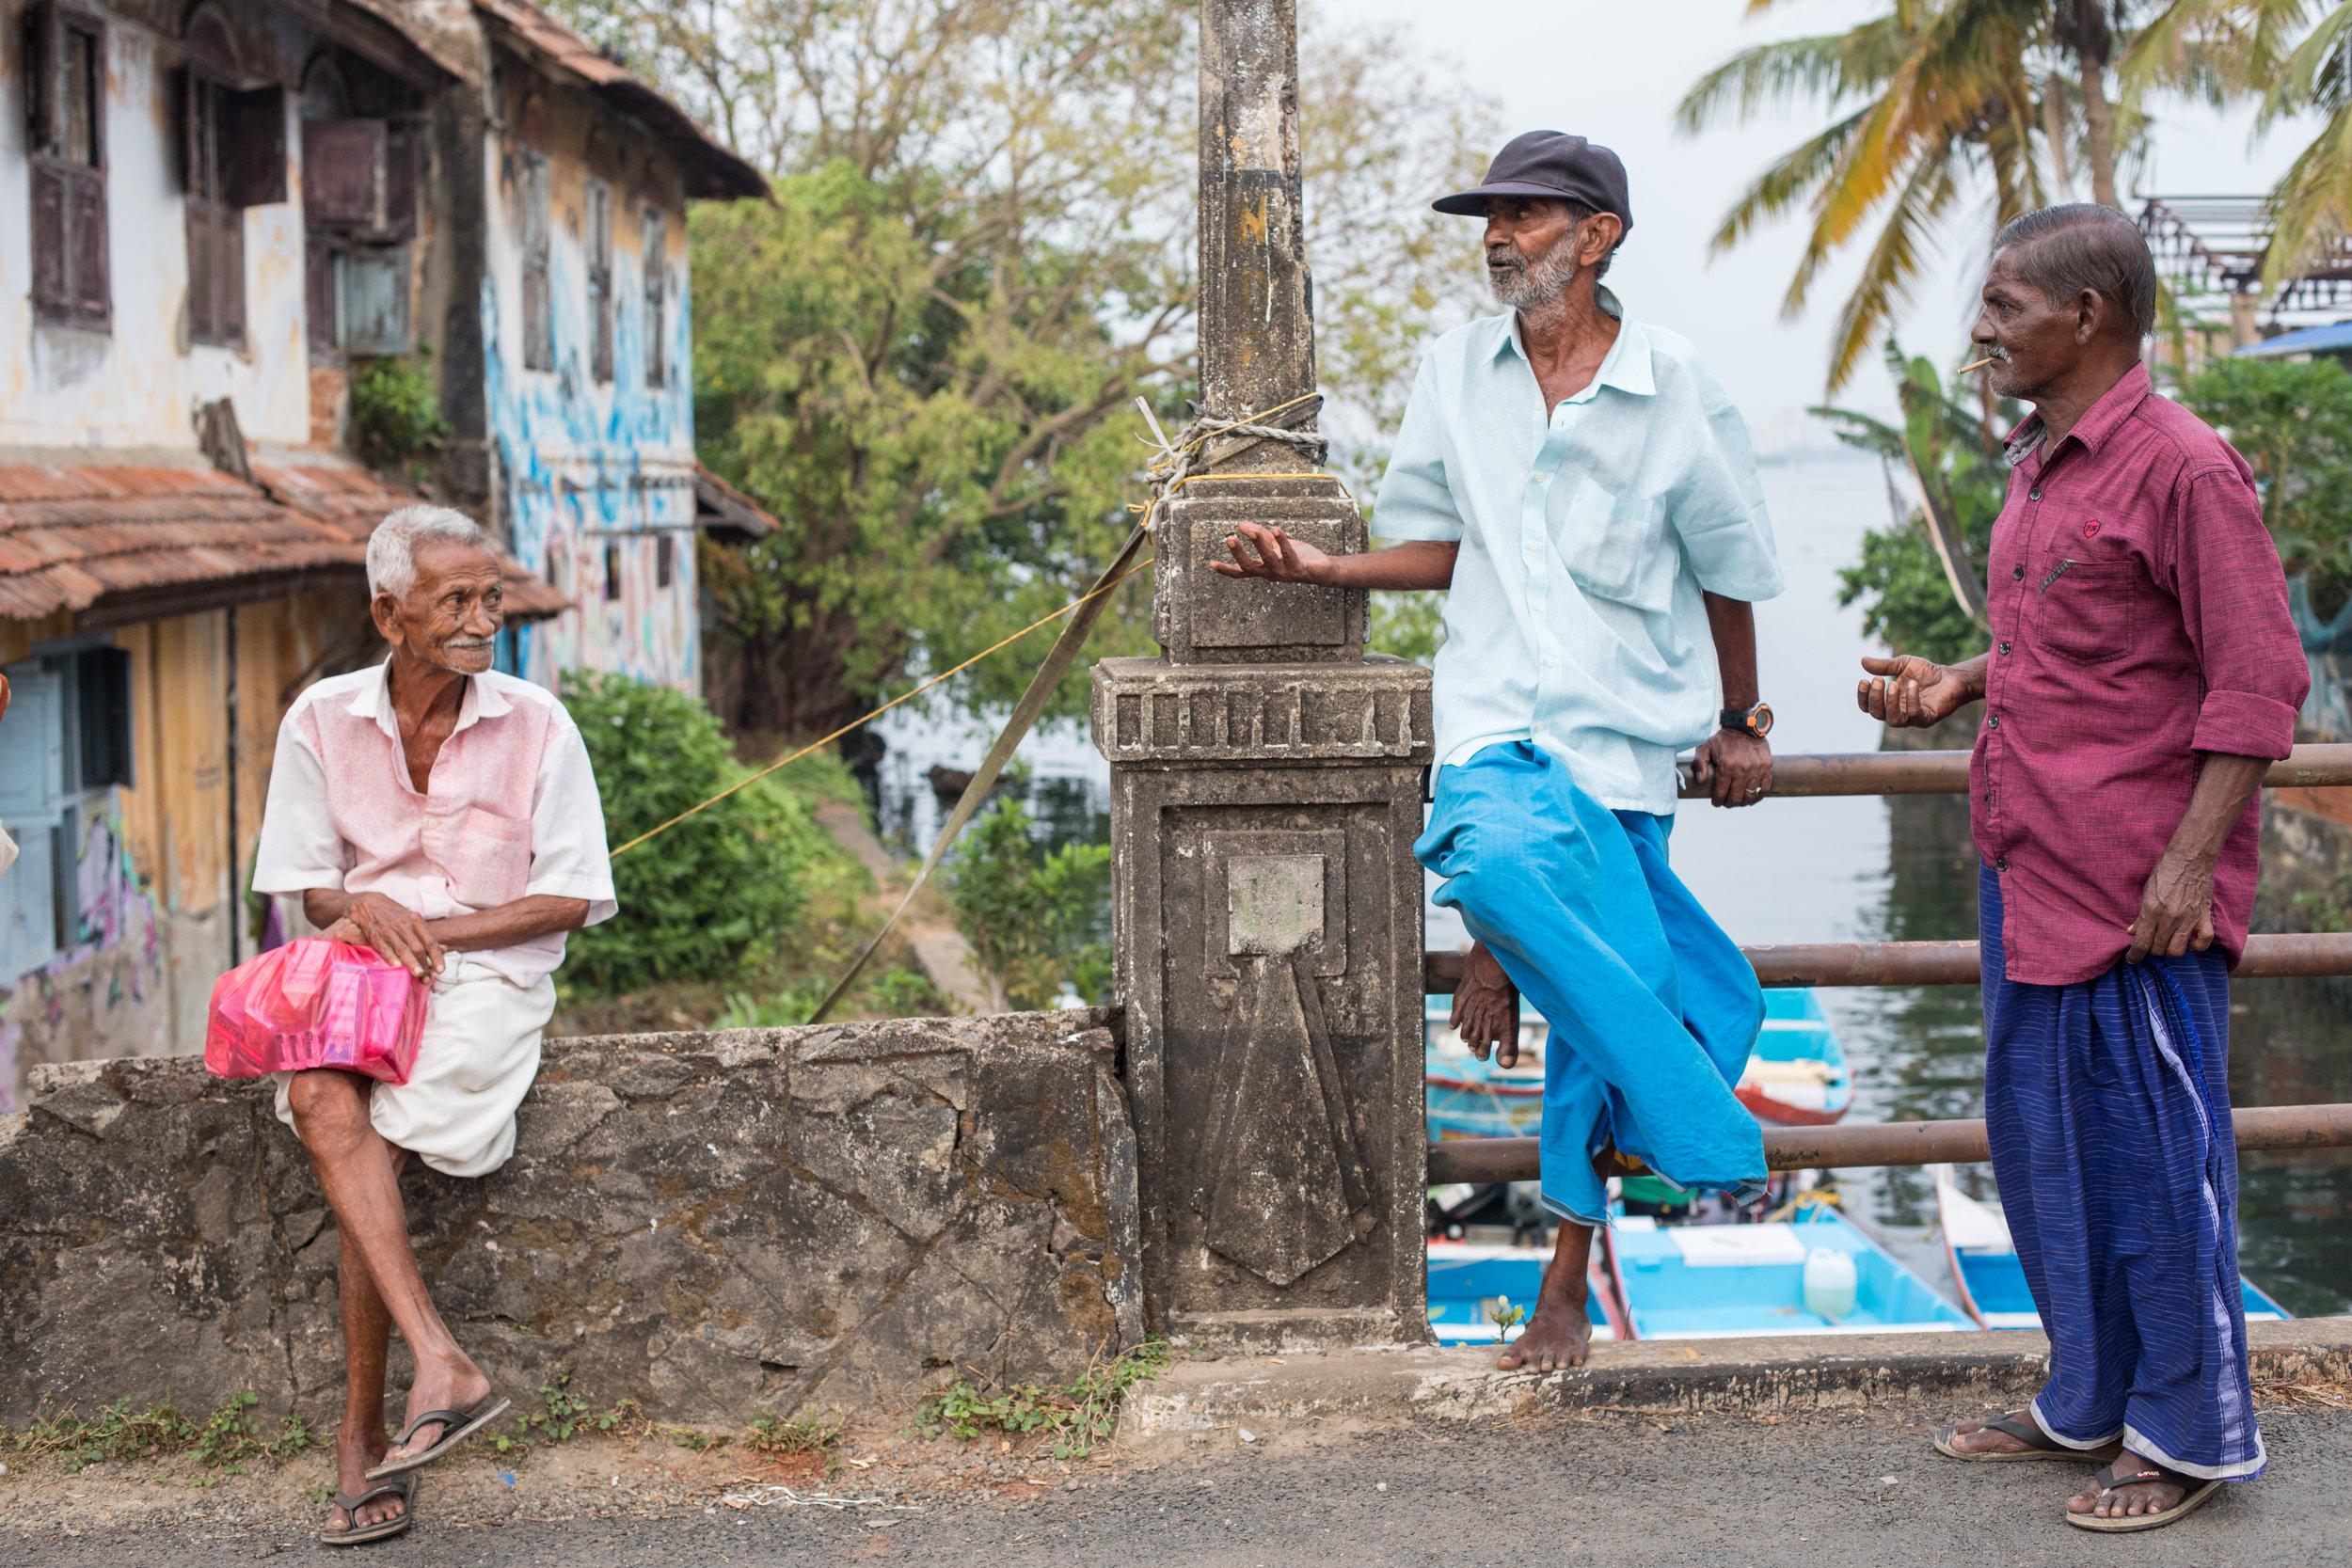 Street Photography in Fort Kochi, Kerala, India.